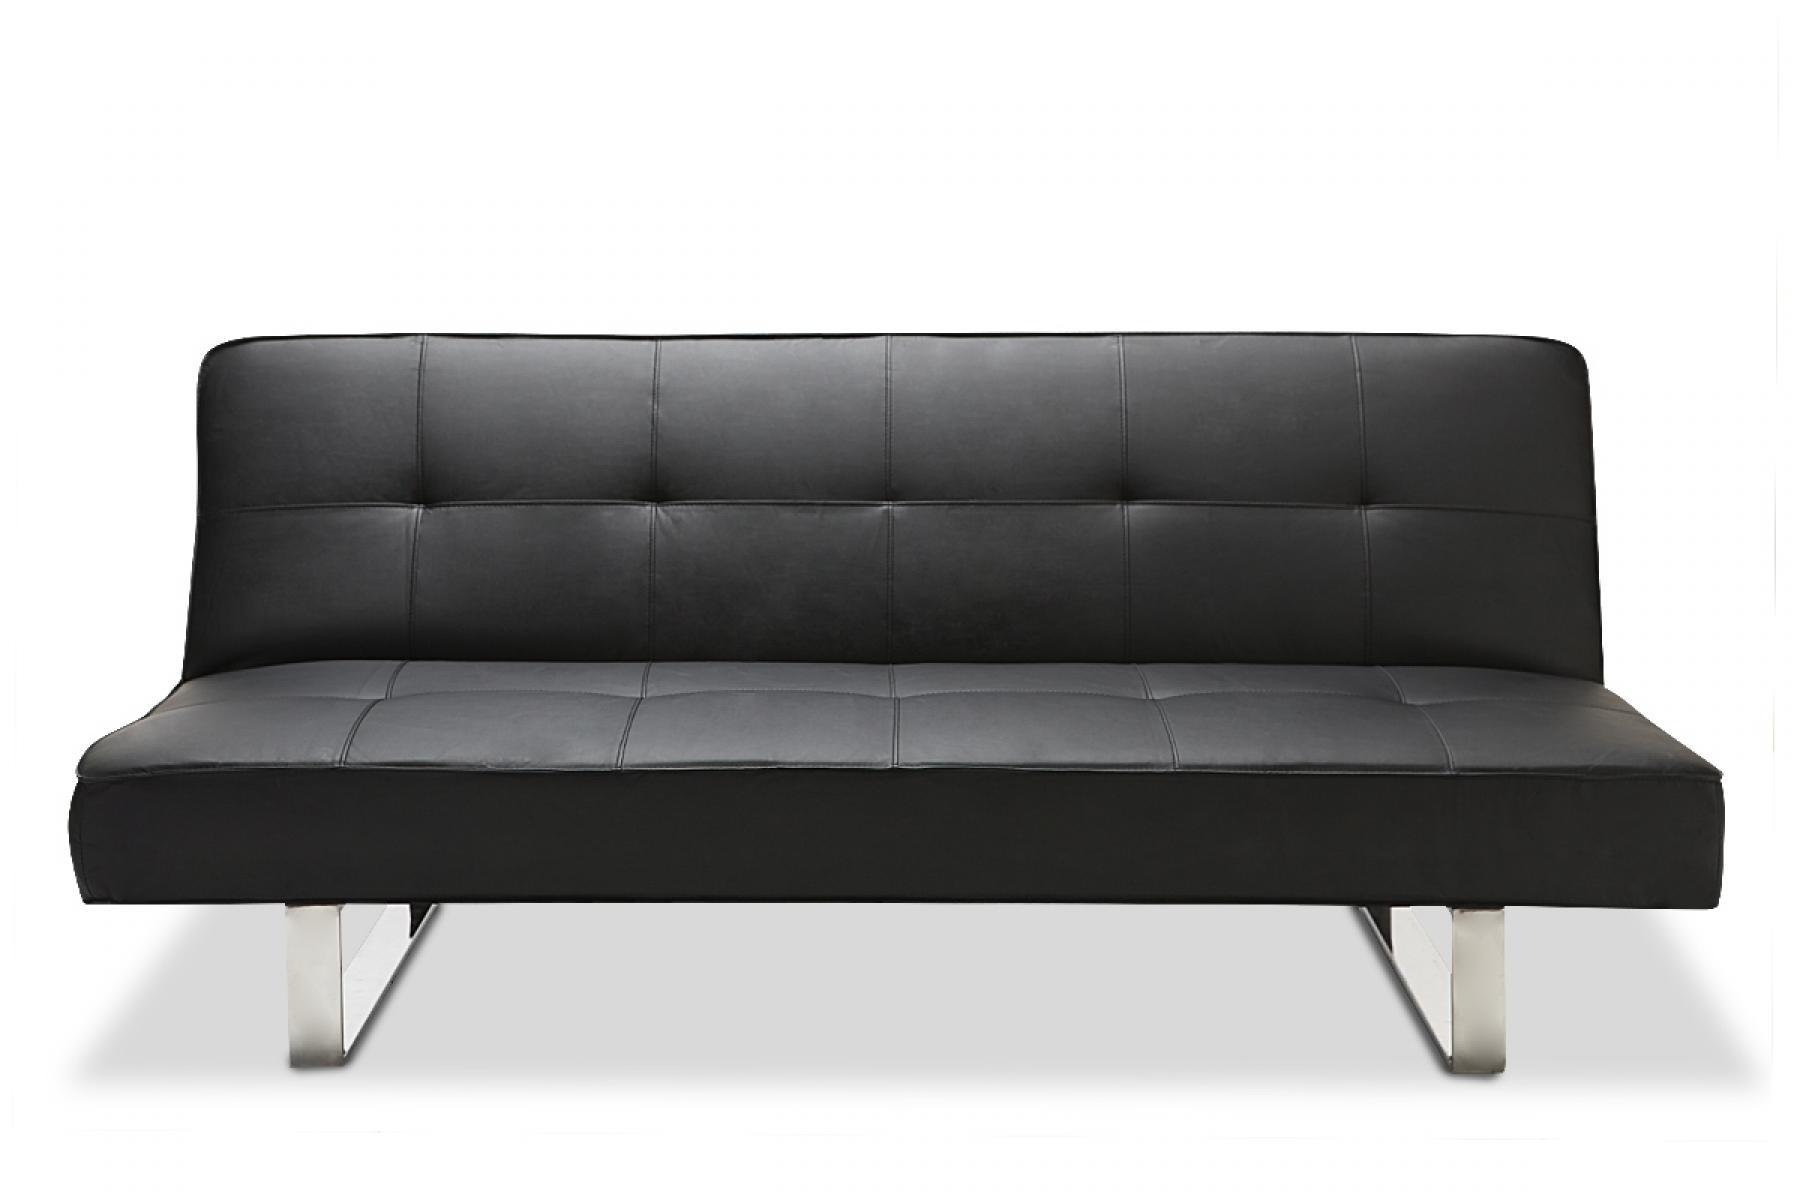 photos canap convertible design pas cher. Black Bedroom Furniture Sets. Home Design Ideas